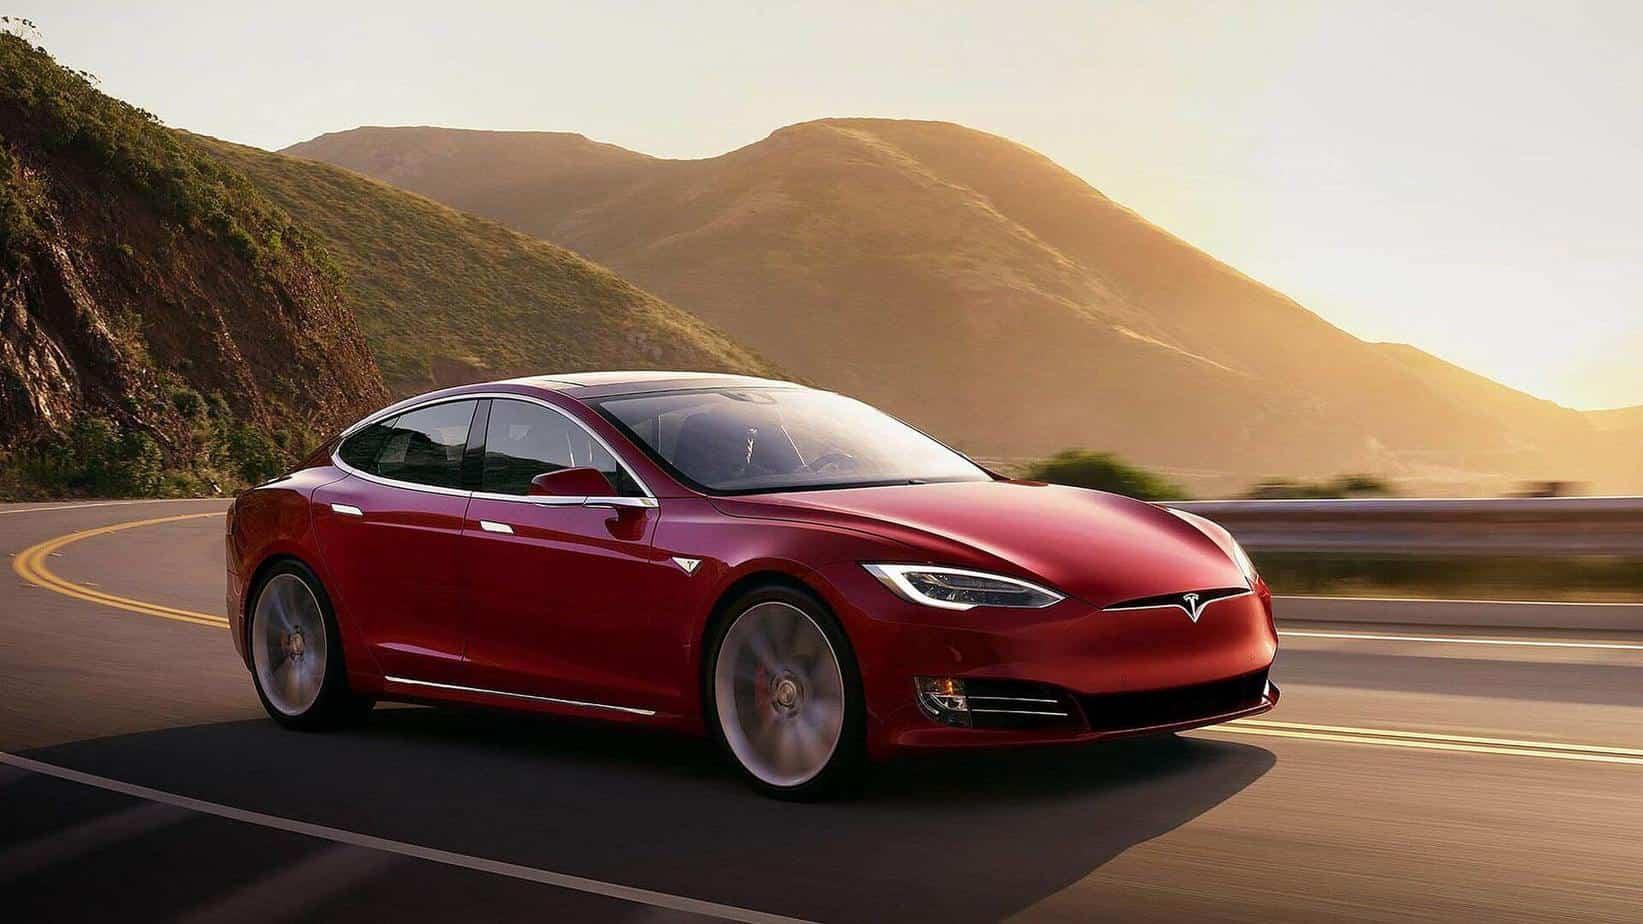 Europes most popular EV isn't a Tesla Nissan or VW… what